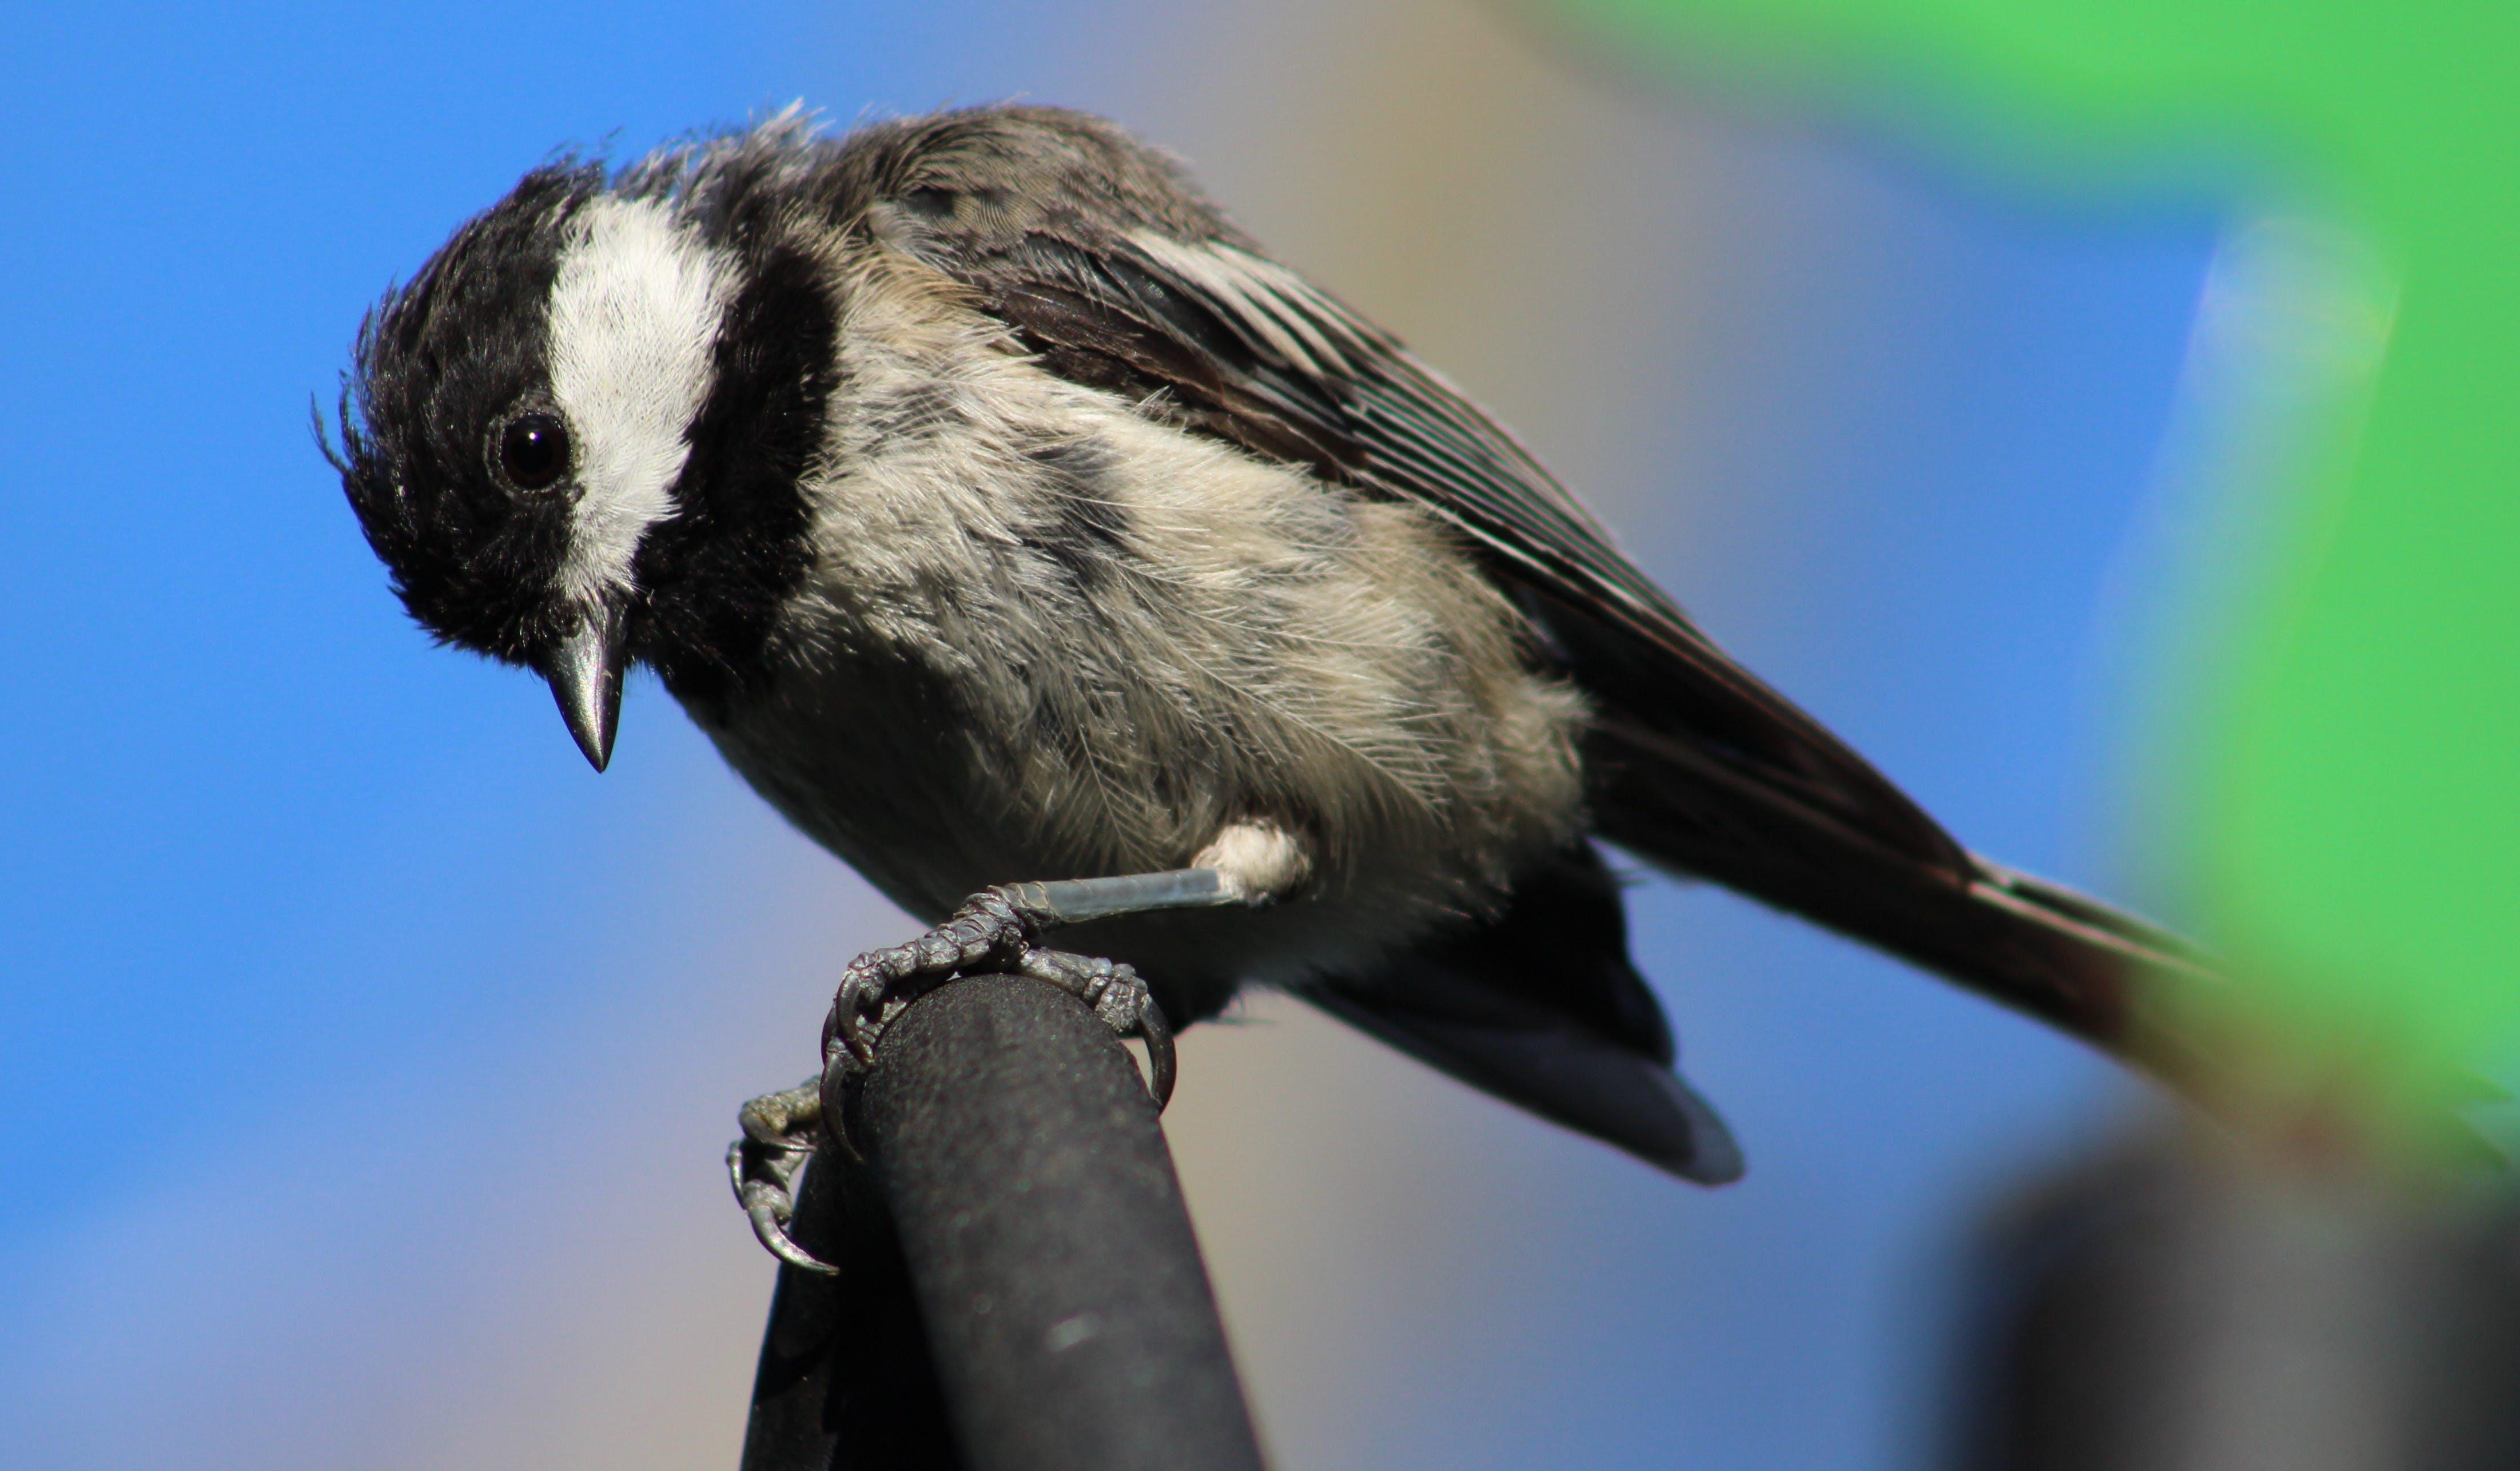 Free stock photo of bird, black and white bird, black-capped chickadee, chickadee